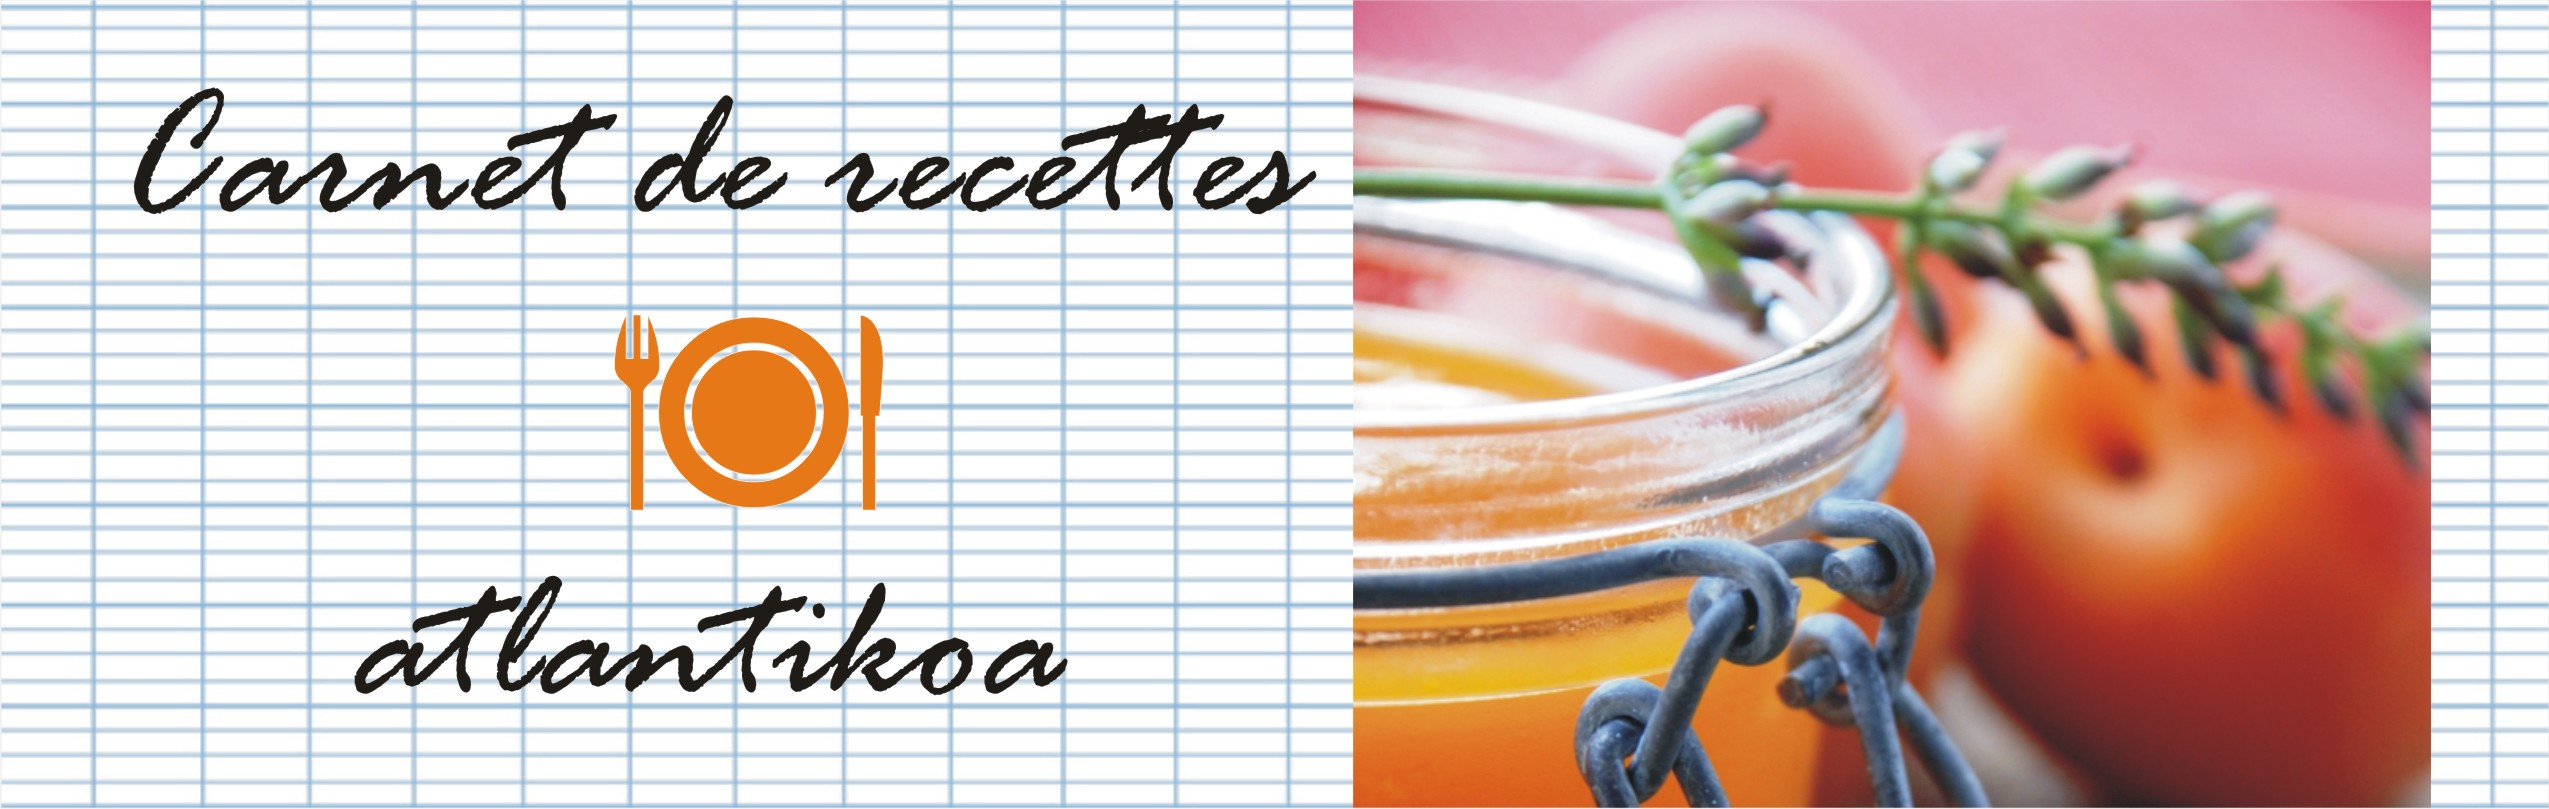 Carnet de recettes d atlantikoa – Atlantikoa chambre d h´tes au